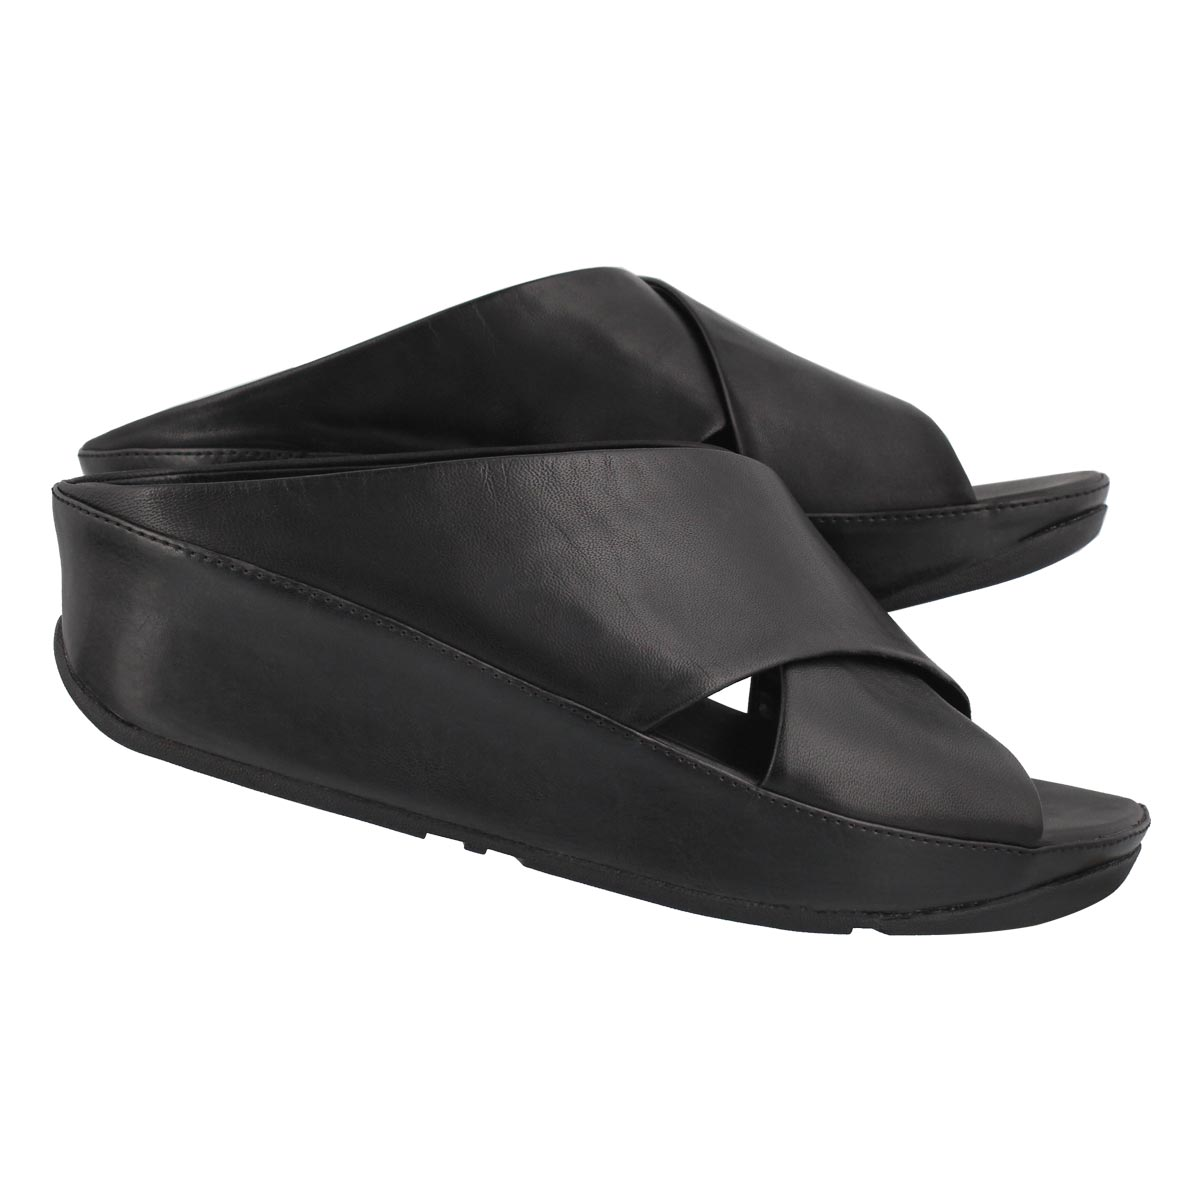 Lds Kys black slide sandal